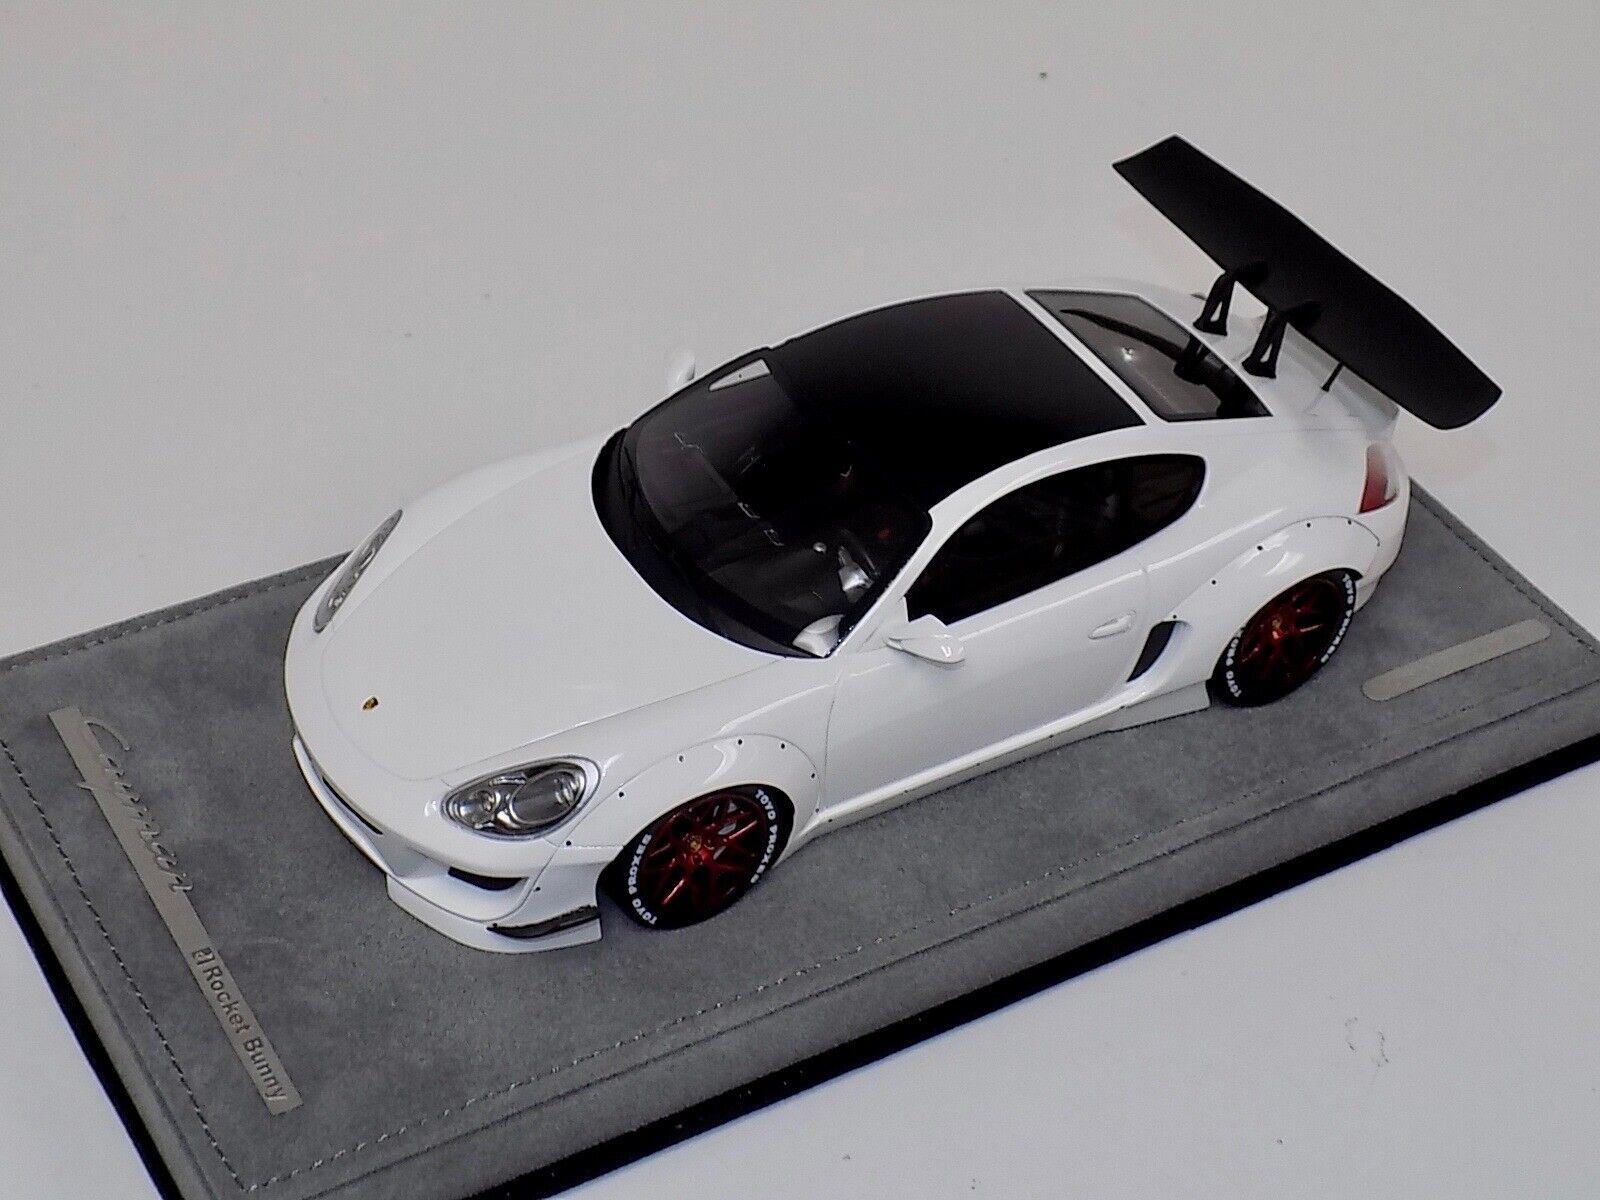 1 18 ab modelos Porsche Cayman Rocket Conejito biancao sin calcomanías Alcantara rosso ruedas